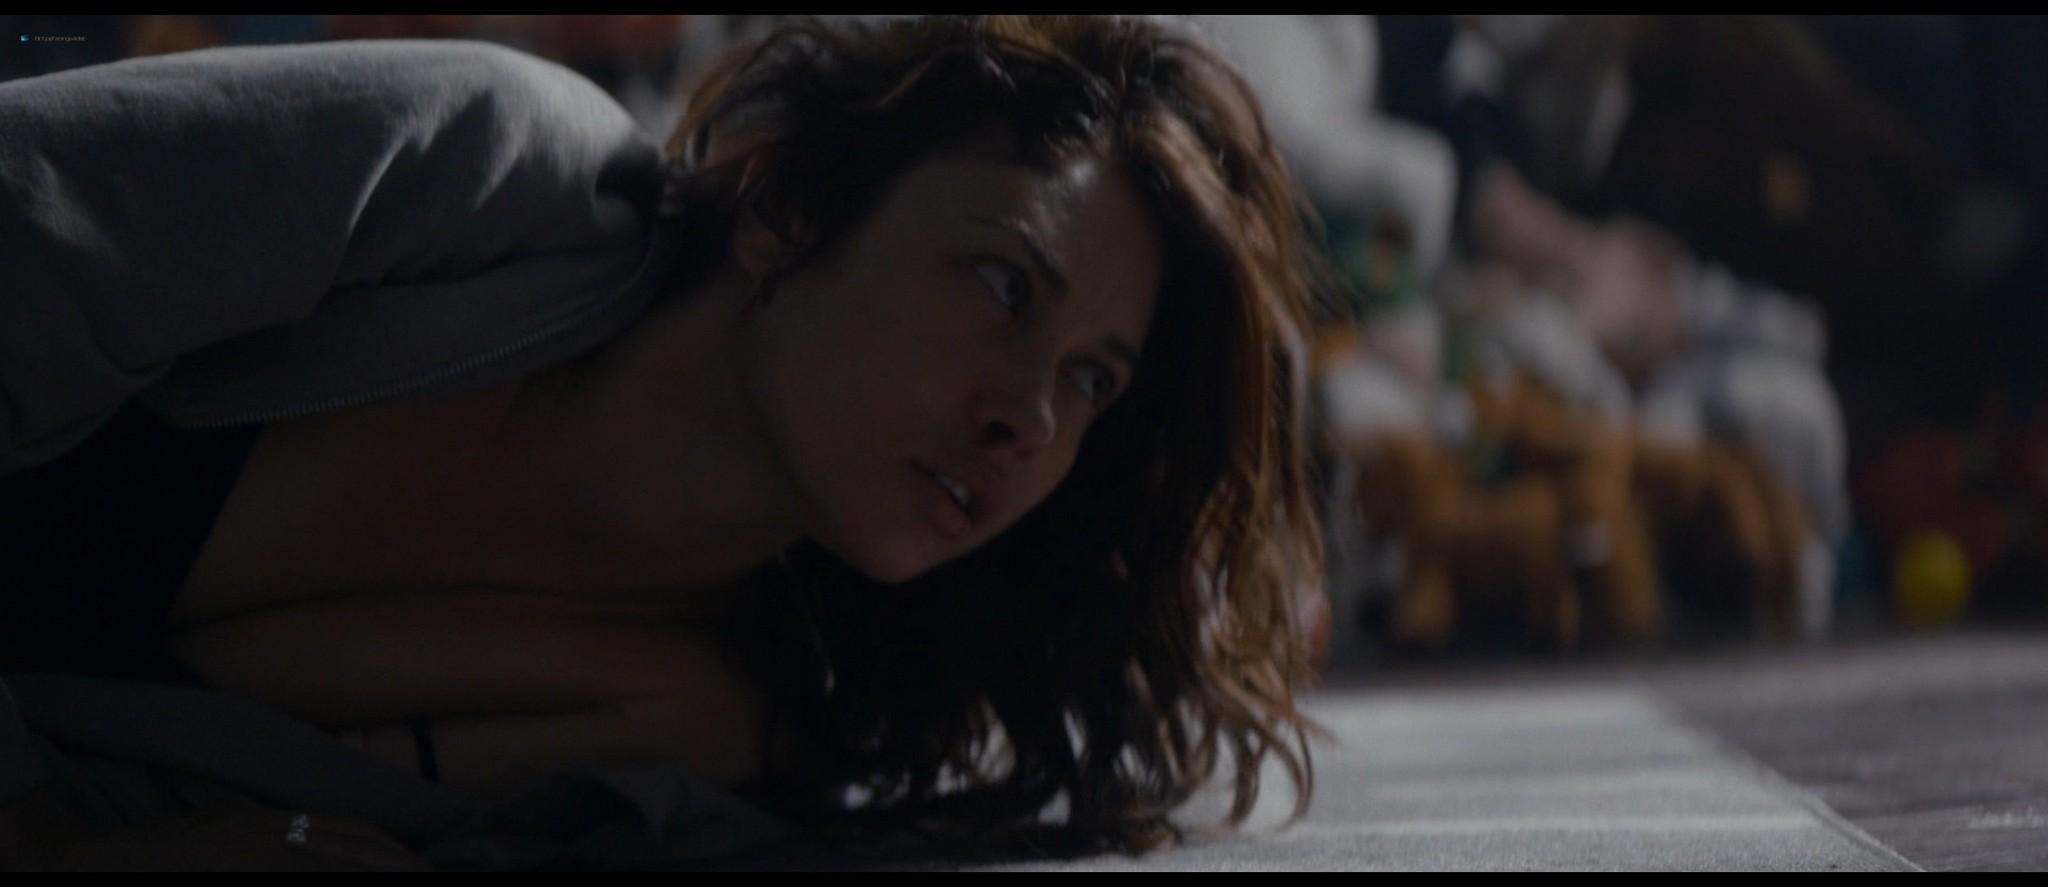 Olga Kurylenko hot and sexy in The Room (2019) HD 1080p BluRay (2)